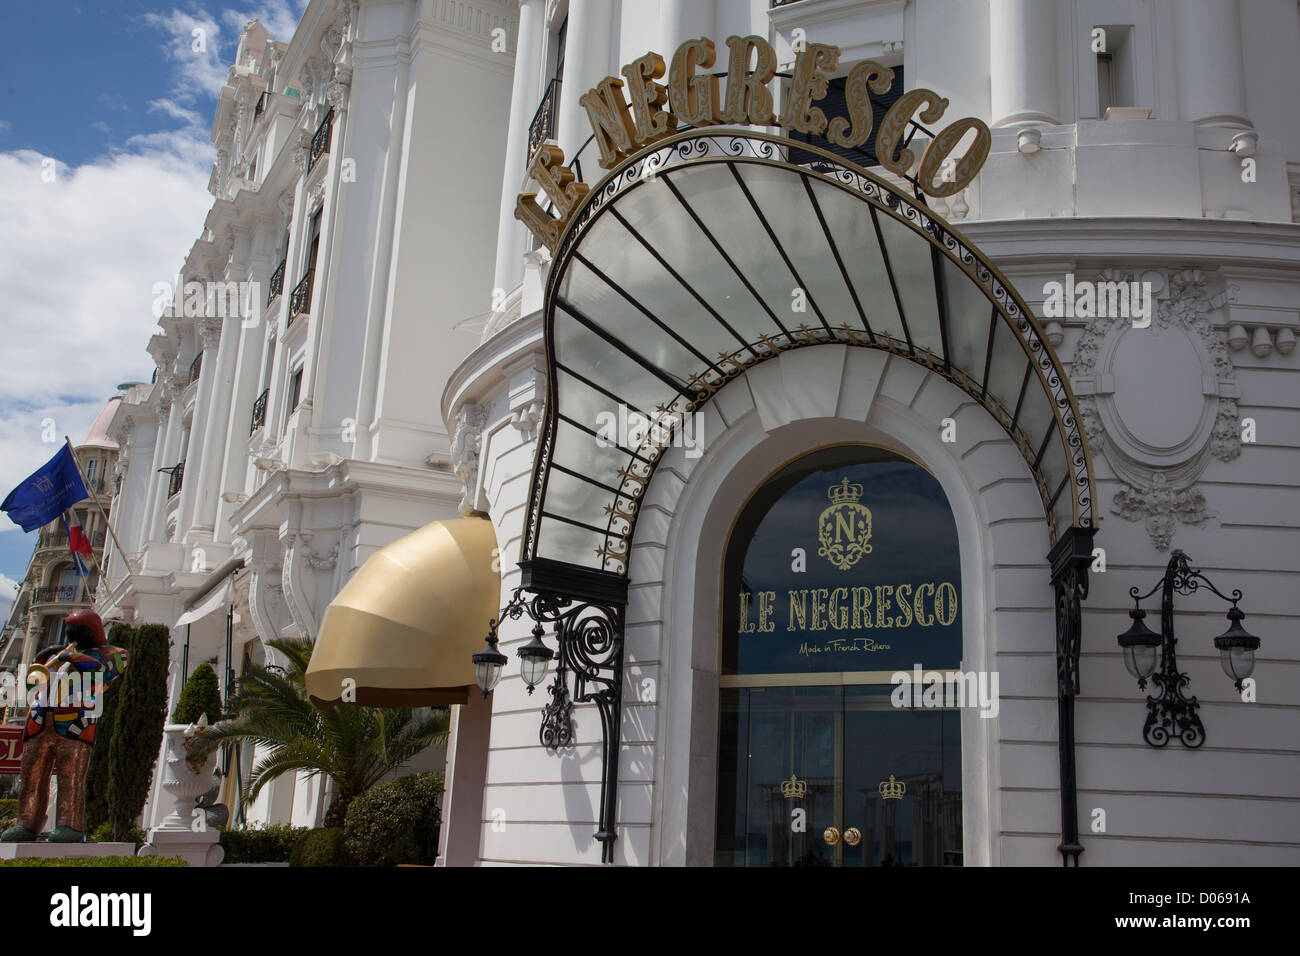 FACADE OF THE 5-STAR HOTEL LE NEGRESCO PROMENADE DES ANGLAIS NNICE ALPES-MARITIMES (06) FRANCE - Stock Image